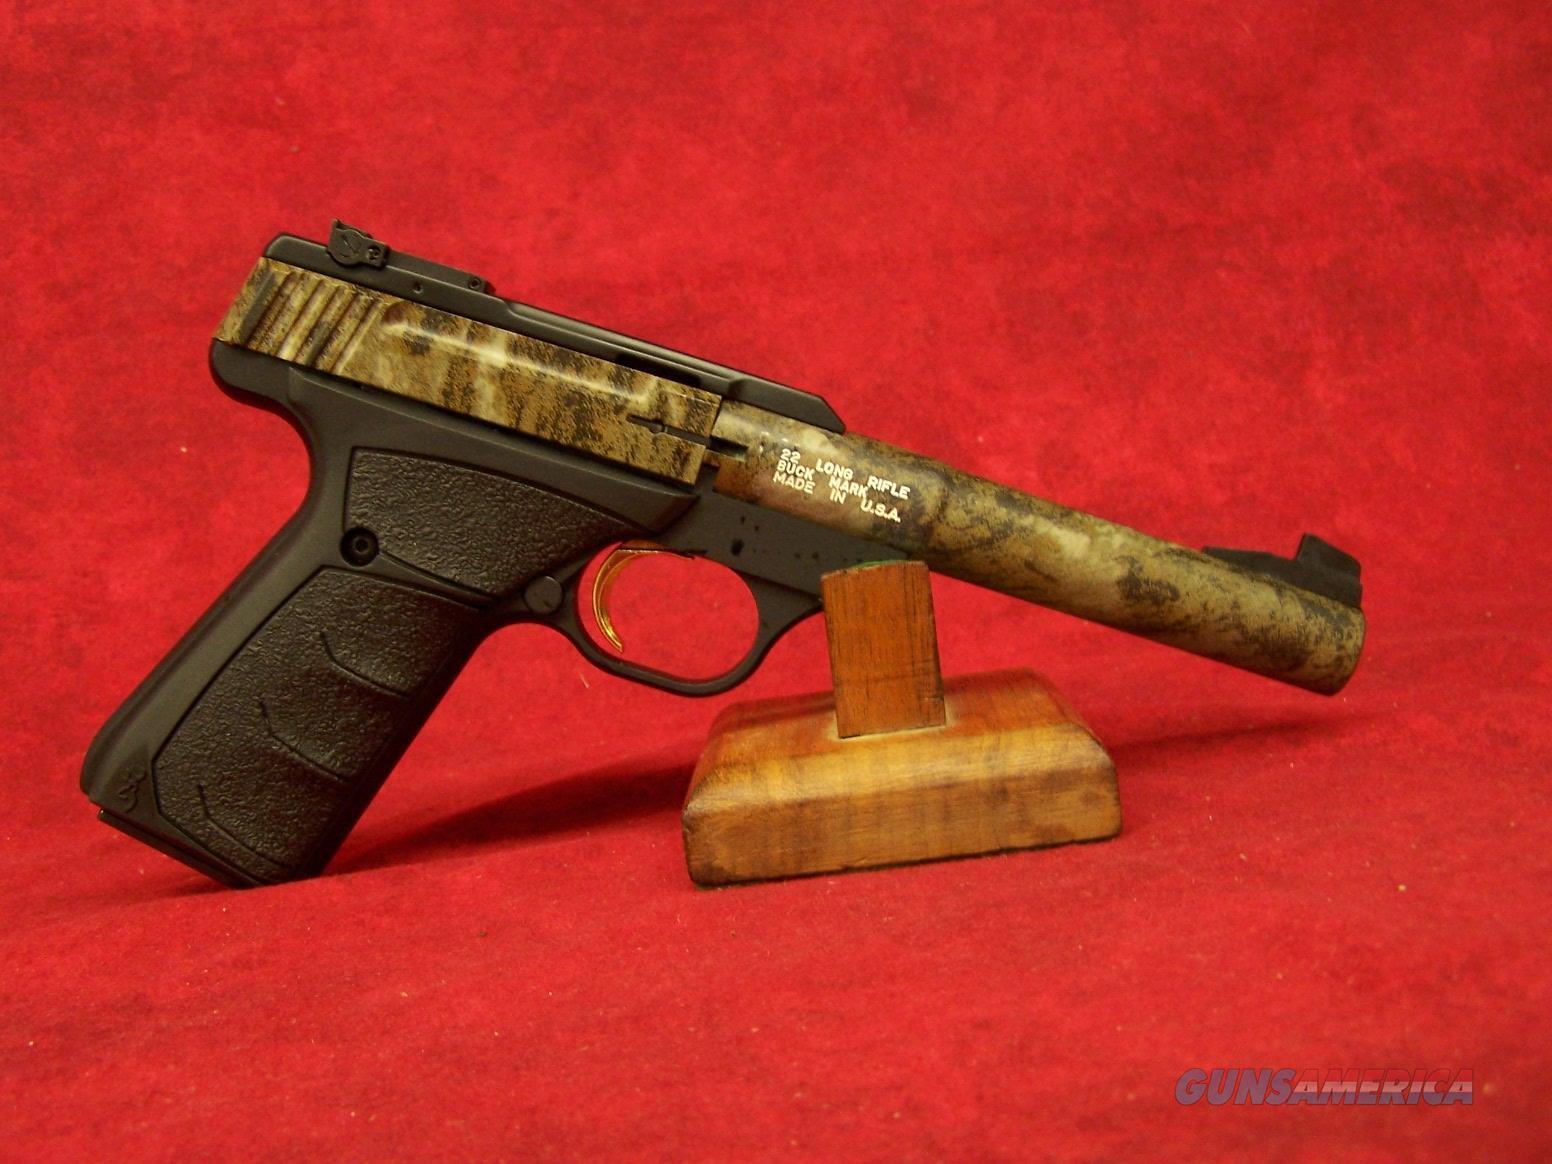 "Browning Buck Mark Camper Mossy Oak Bottomlands Shot Show Firearm .22LR 5 1/2"" Barrel (051513490)  Guns > Pistols > Browning Pistols > Buckmark"